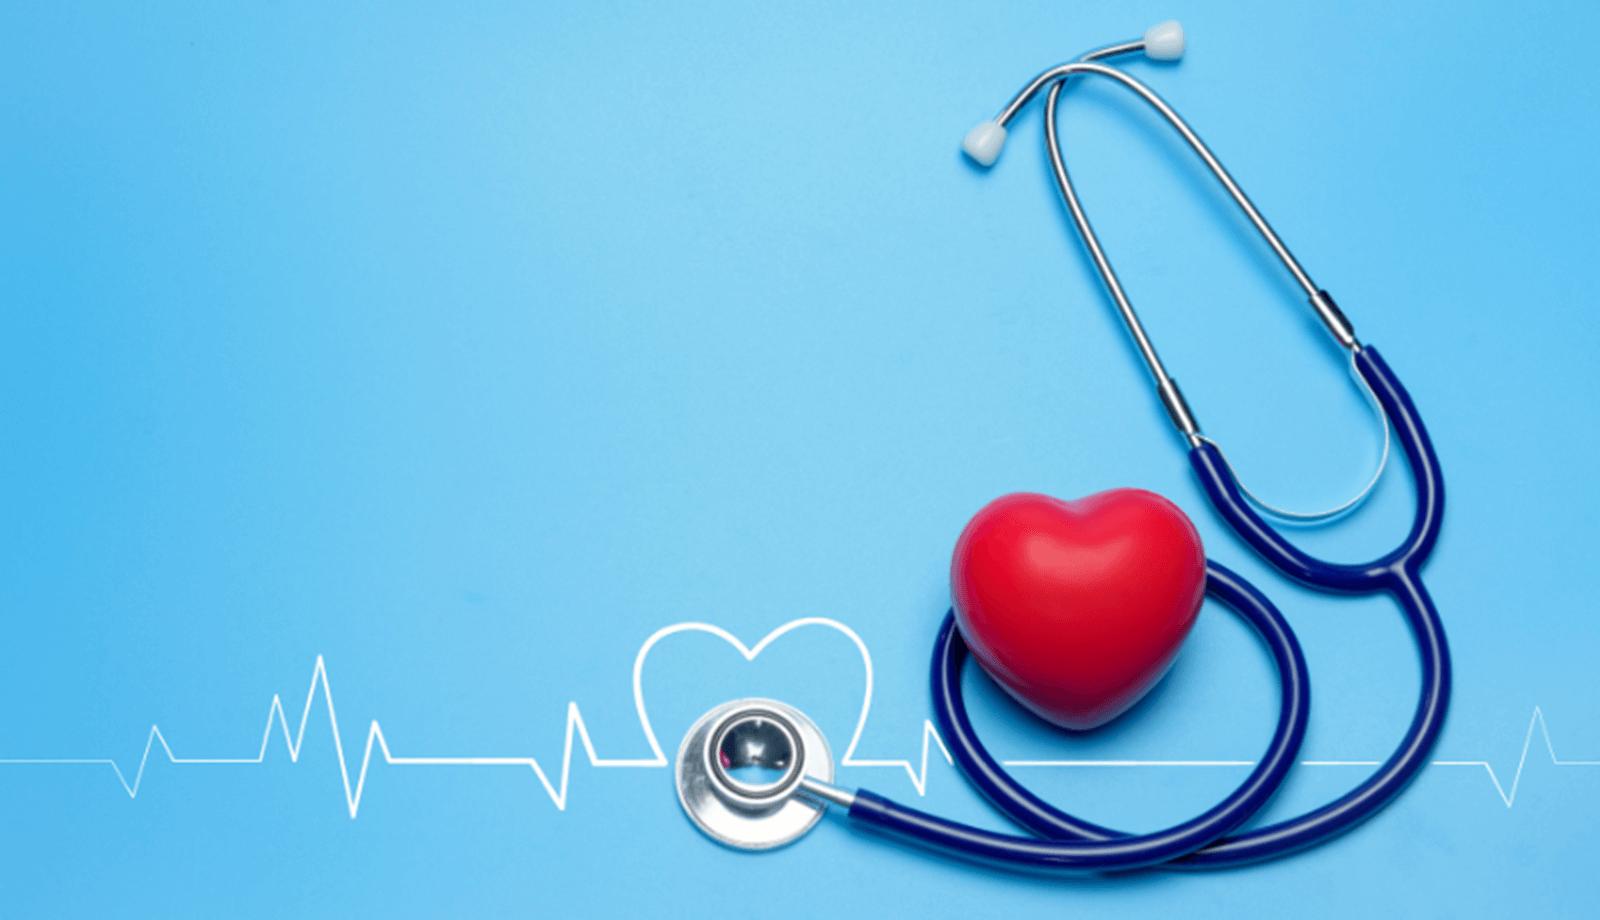 magas vérnyomás 2020 nap